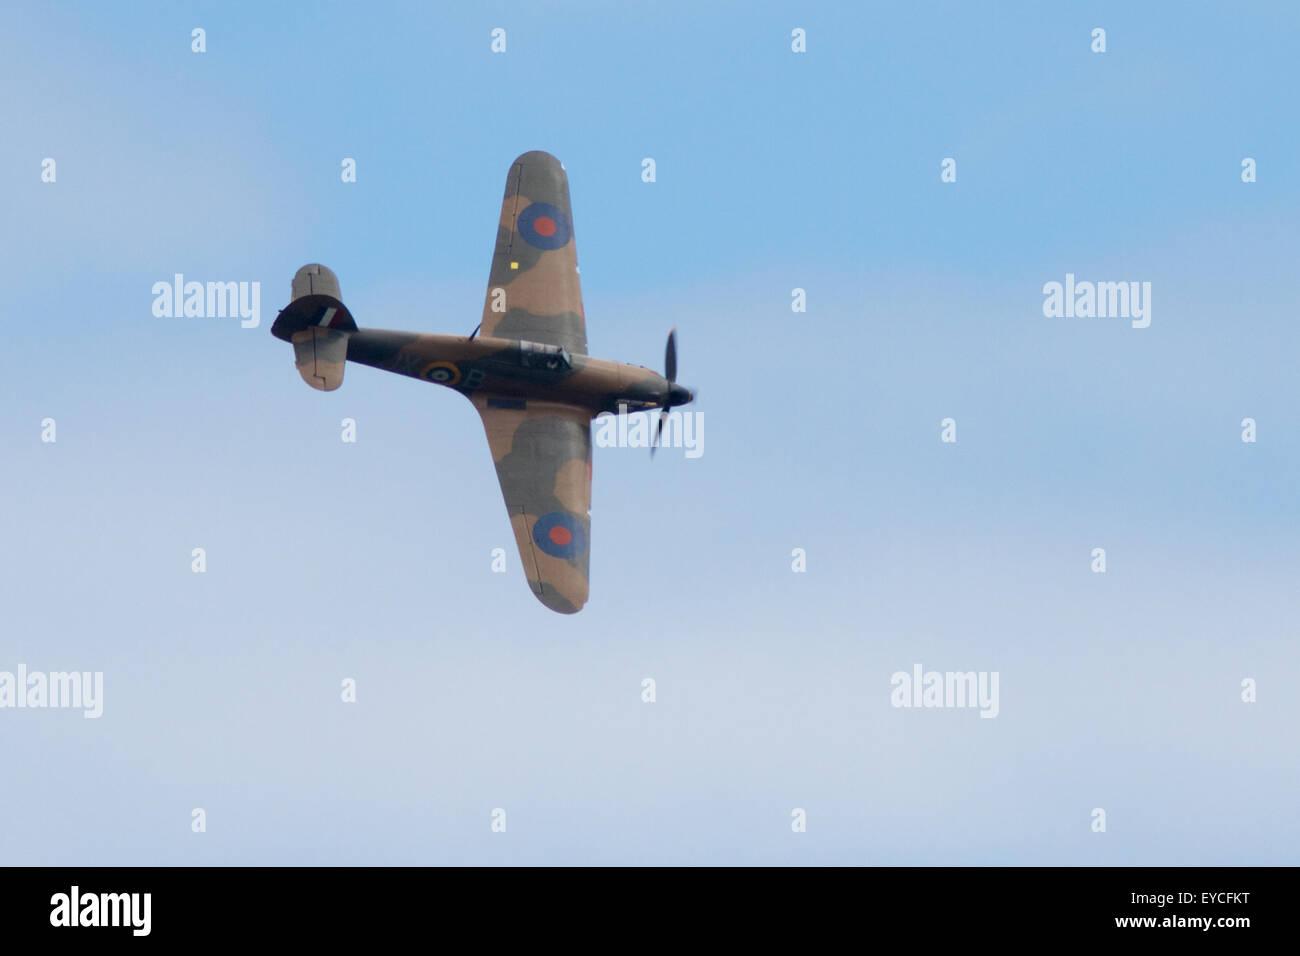 Sunderland, UK. 25th July, 2015. WW2 Hurricane flying at the Sunderland Airshow, July 2015 Credit:  Robert Cole/Alamy - Stock Image